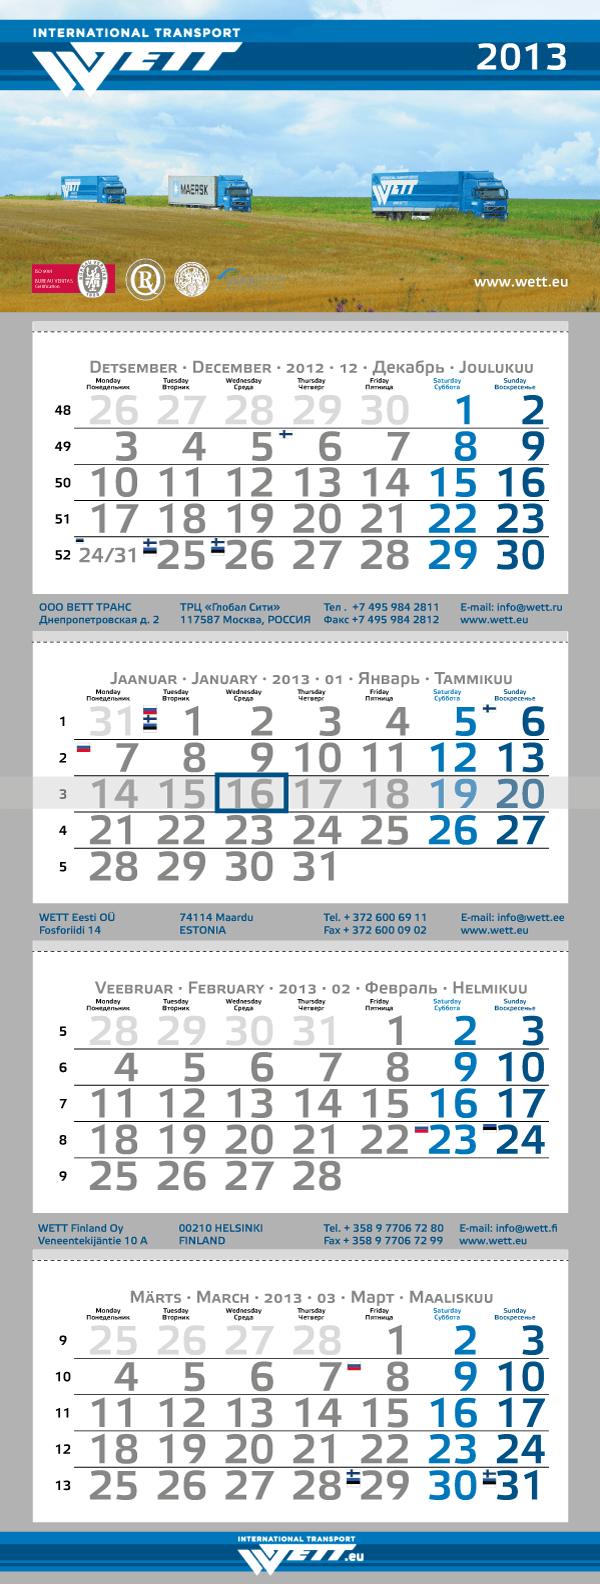 Wett Calendar 2013 kalendri kujundus big